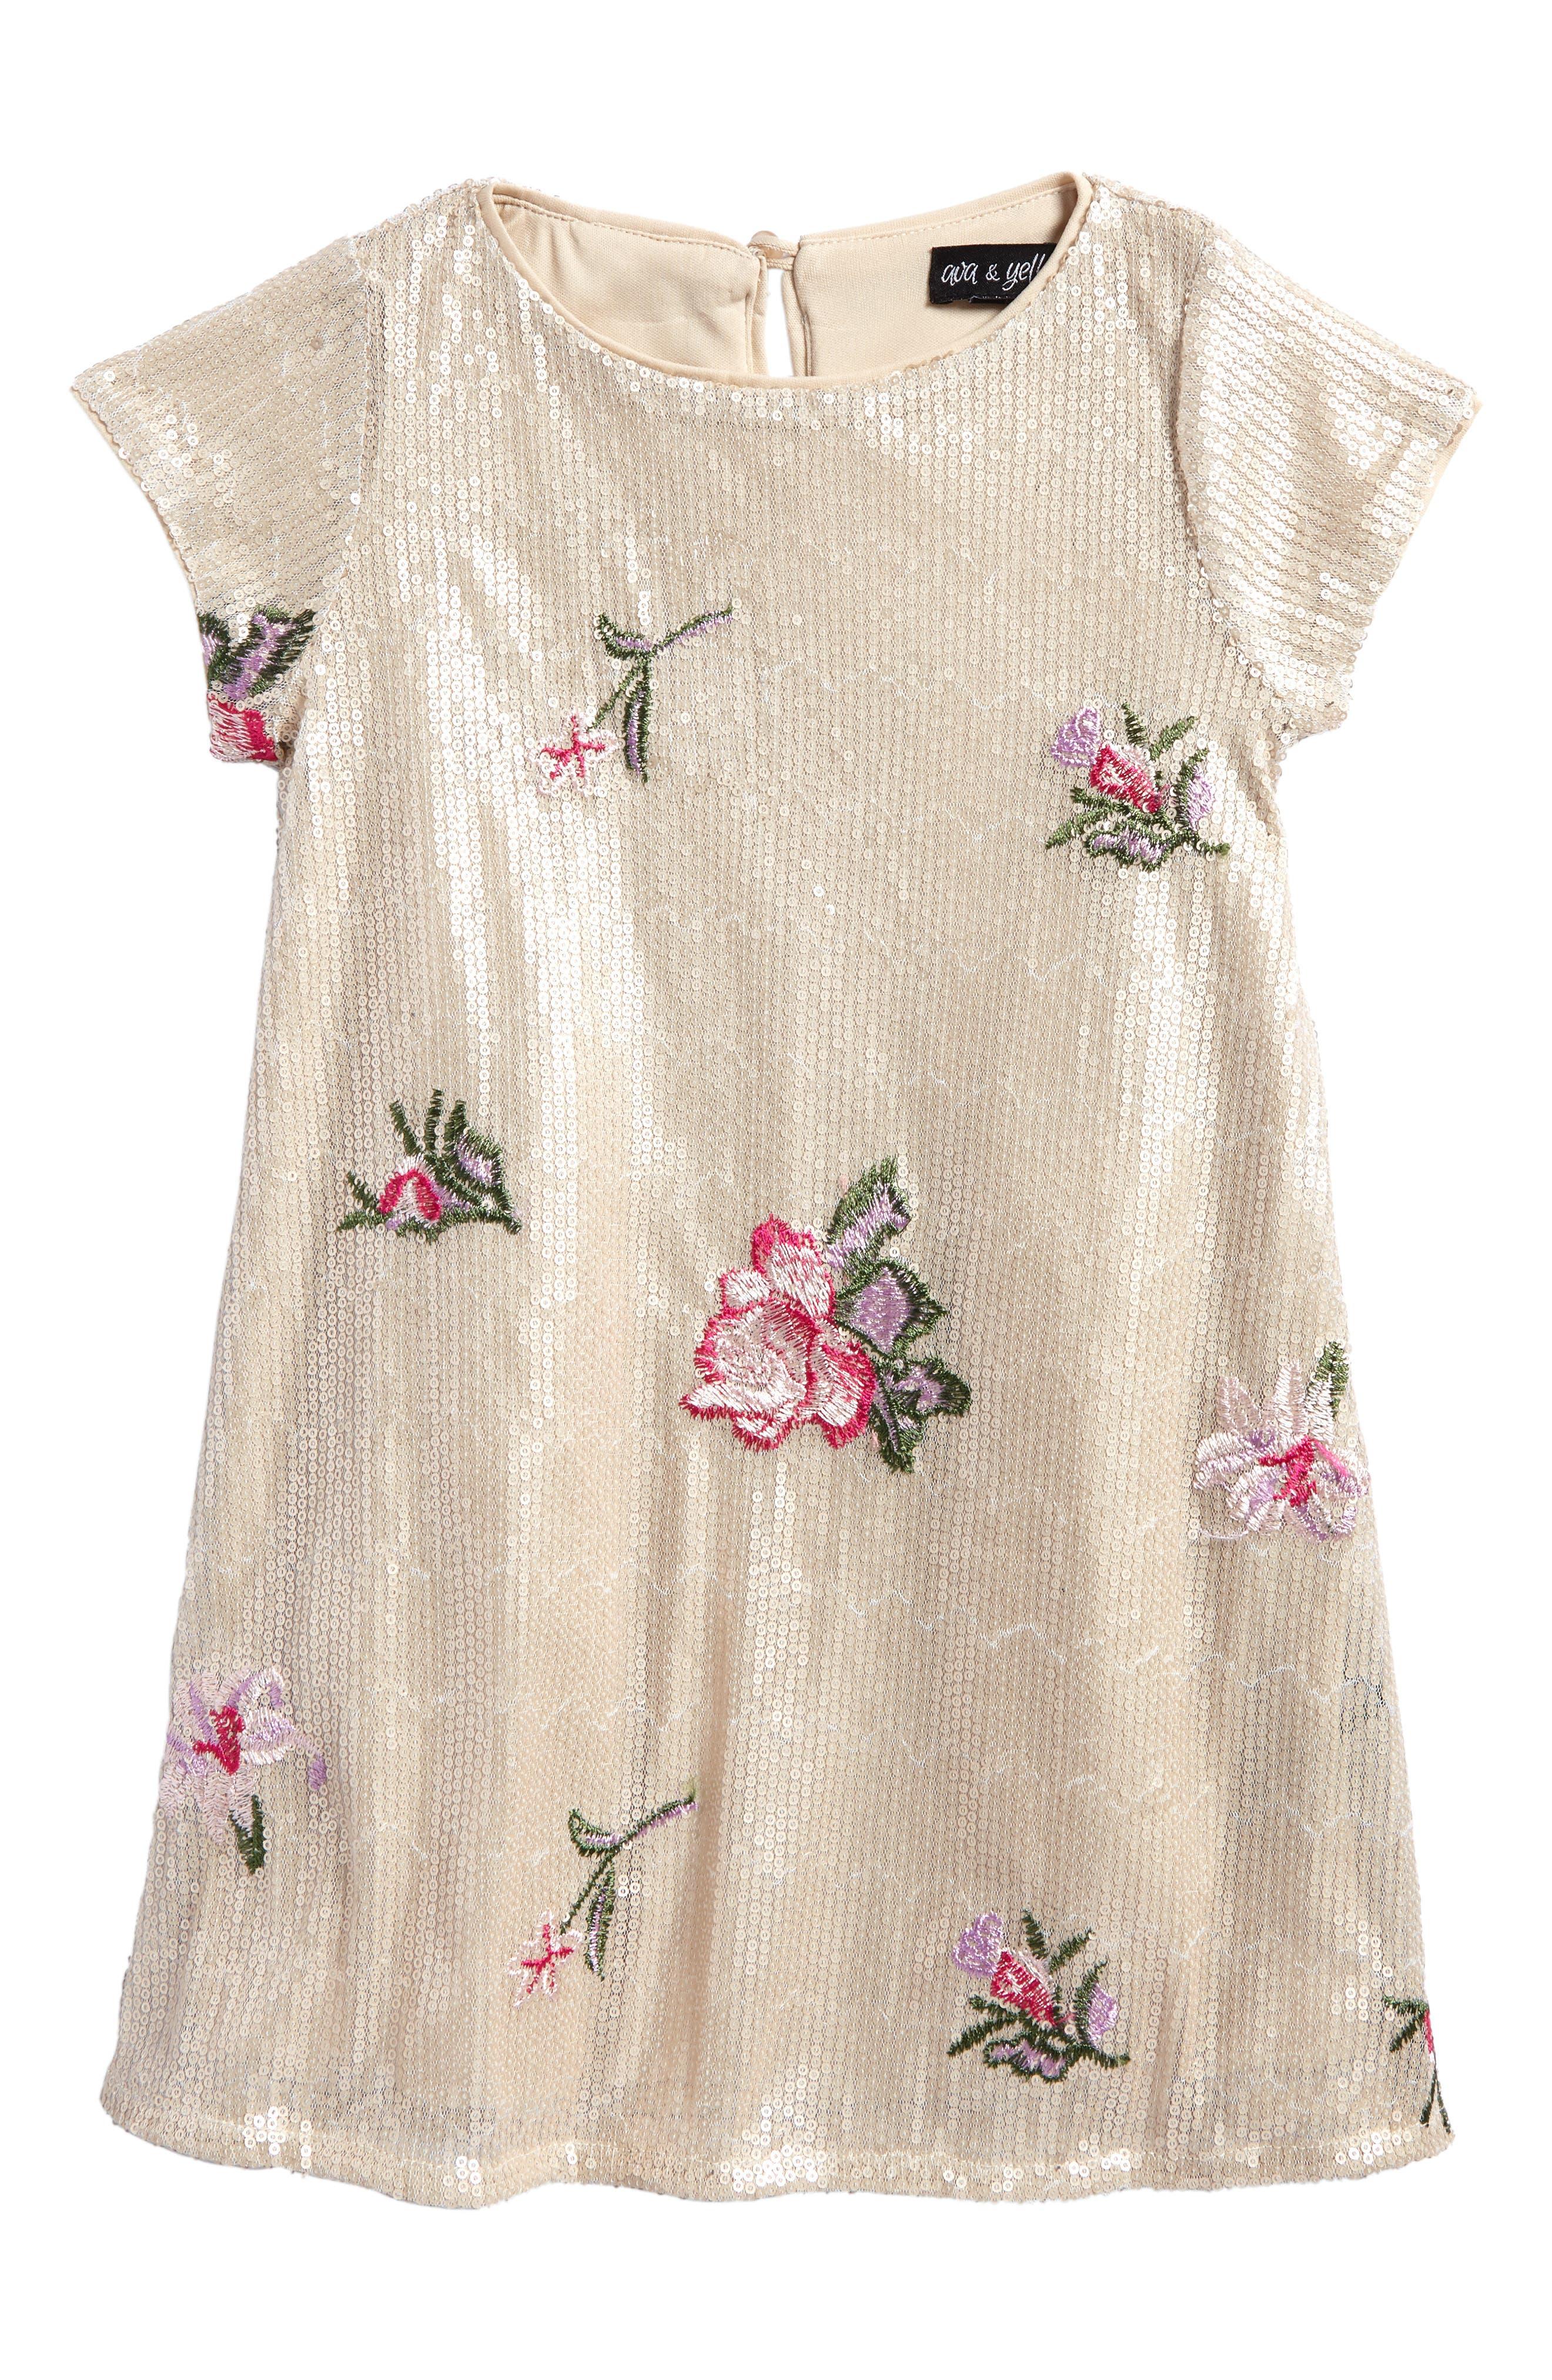 Ava & Yelly Embroidered Sequin Shift Dress (Toddler Girls & Little Girls)